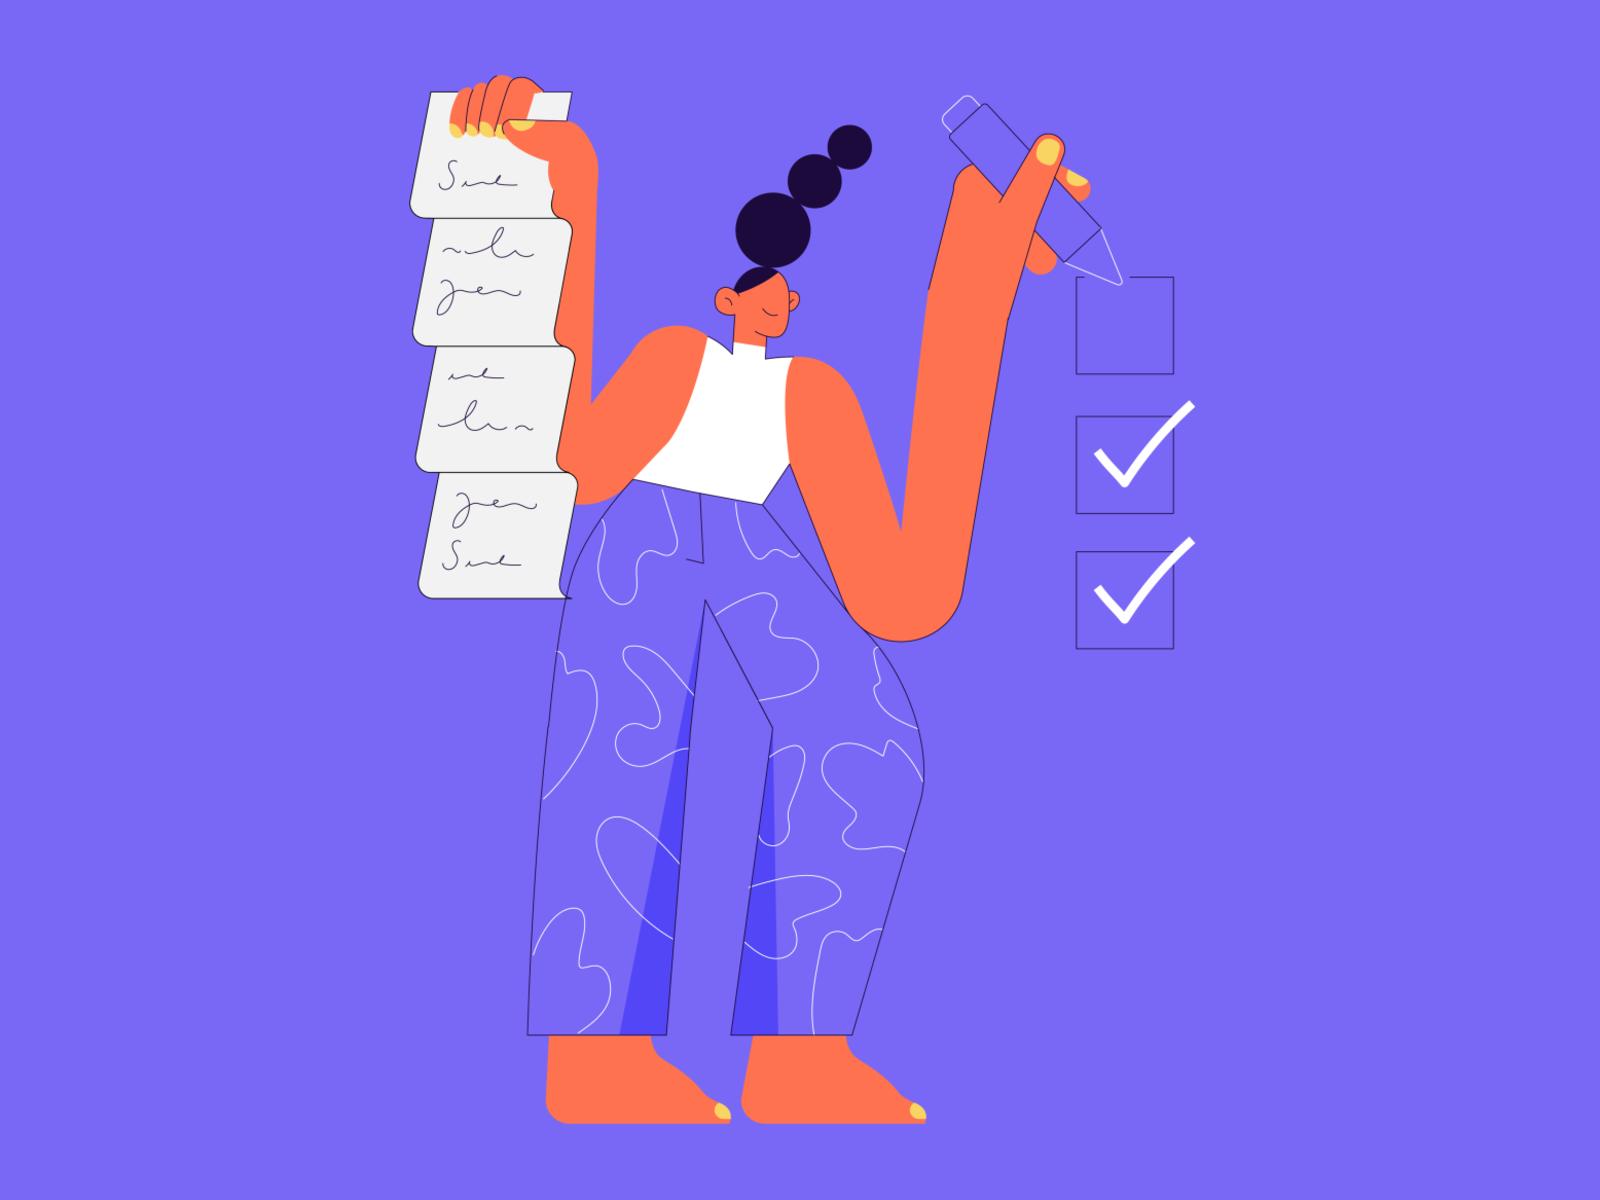 Checklist by Sara Utgés